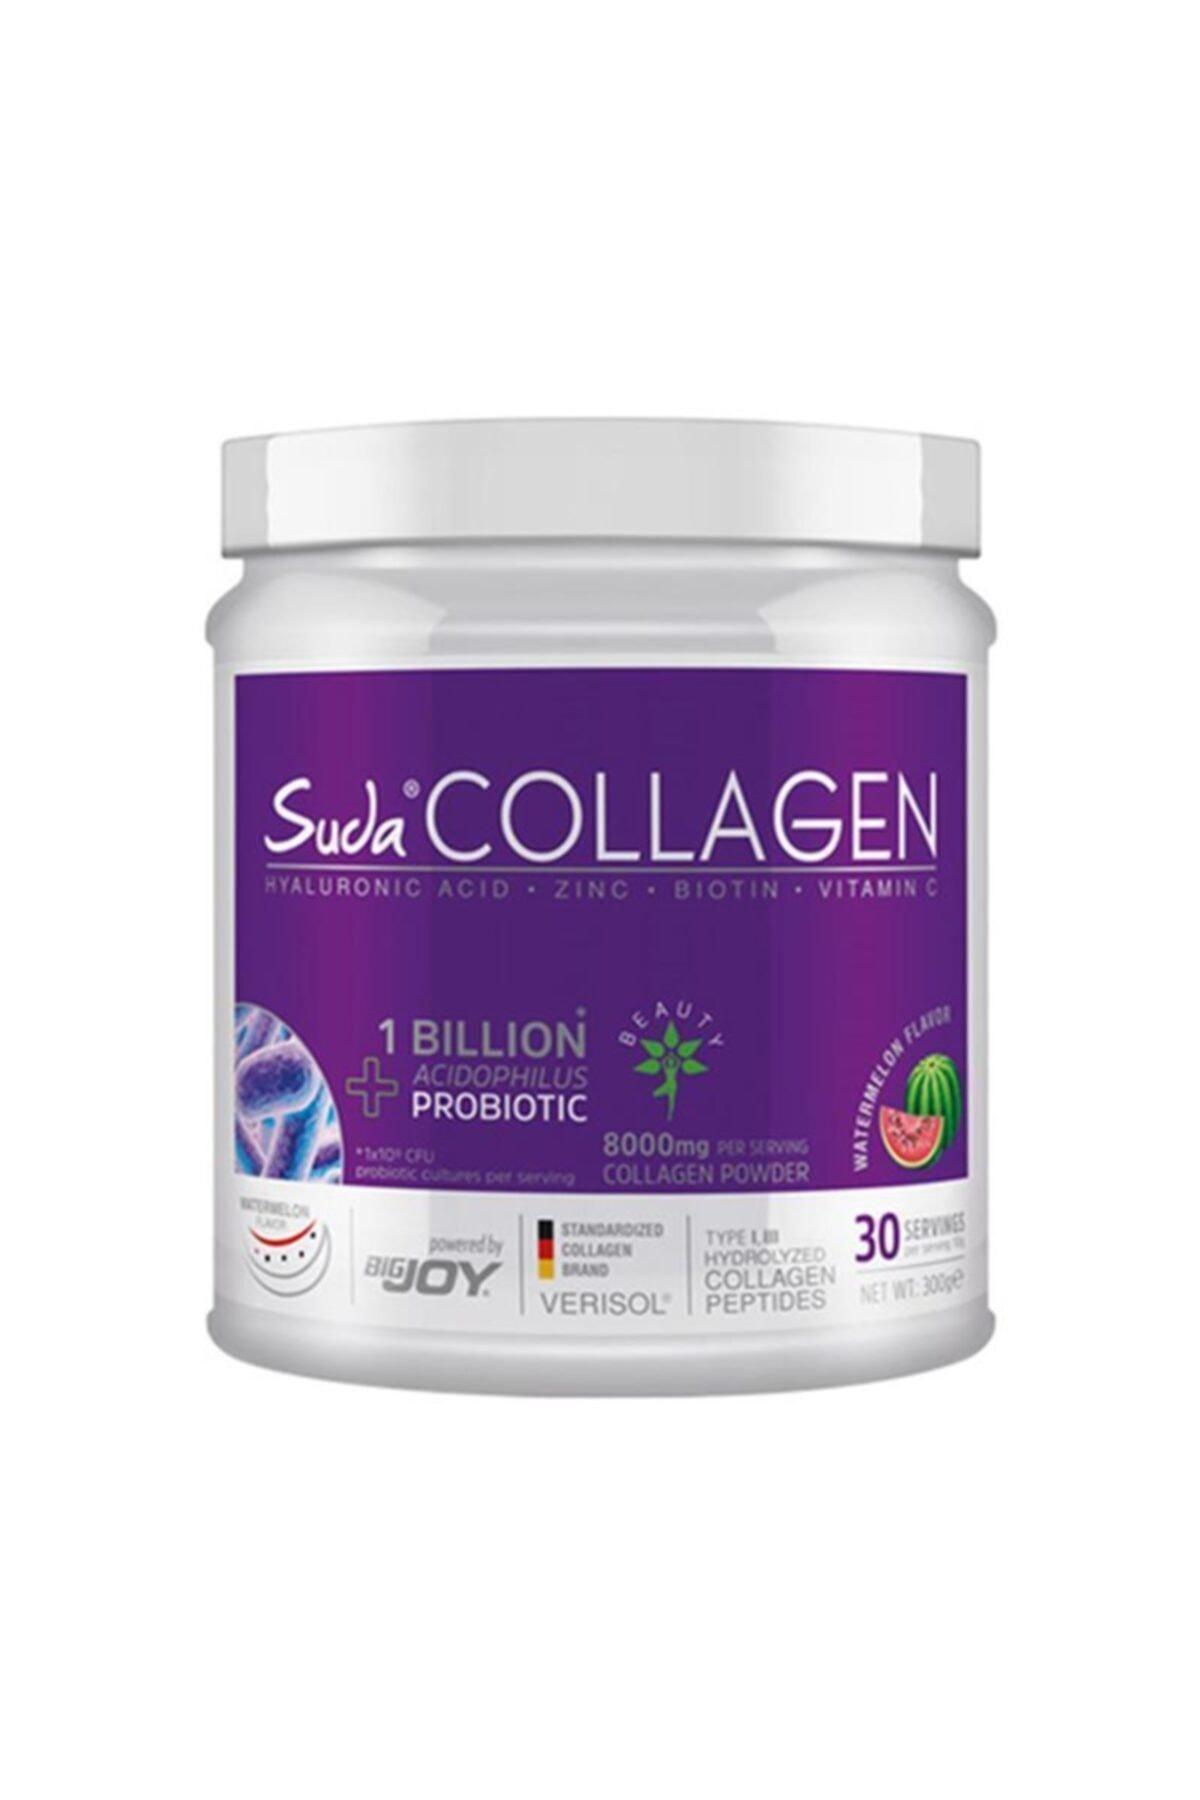 Suda Collagen Karpuz Aromalı Probiotic Watermelon 300 gr 1